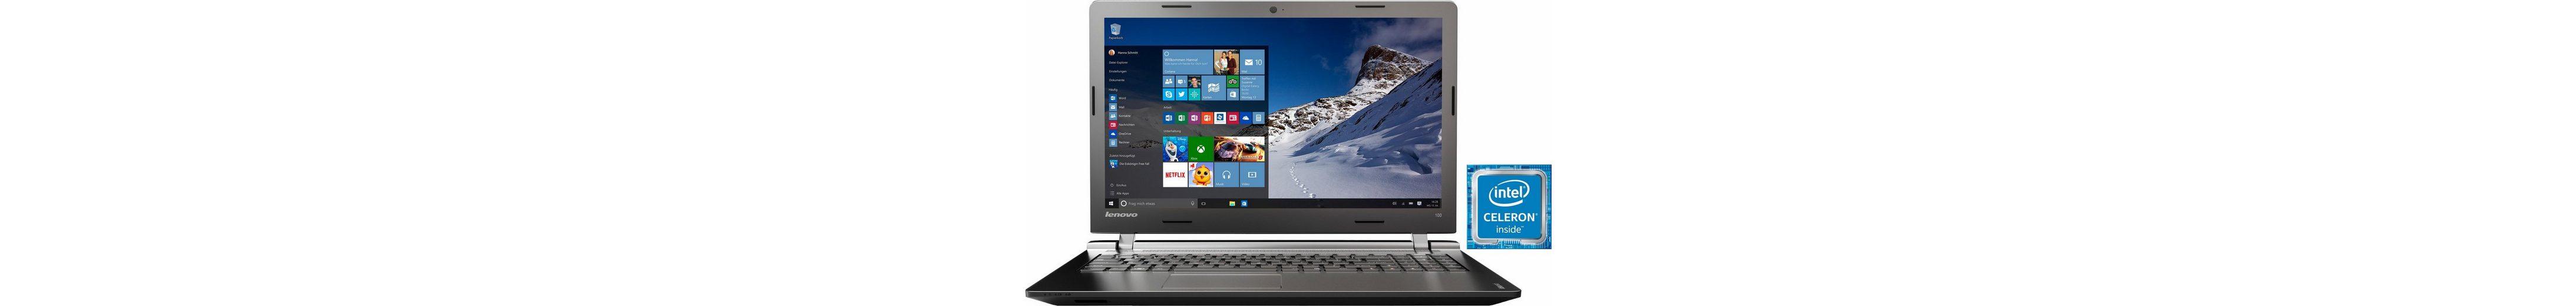 Lenovo IdeaPad 100-15IBY Notebook, Intel® Celeron™, 39,6 cm (15,6 Zoll), 500 GB Speicher